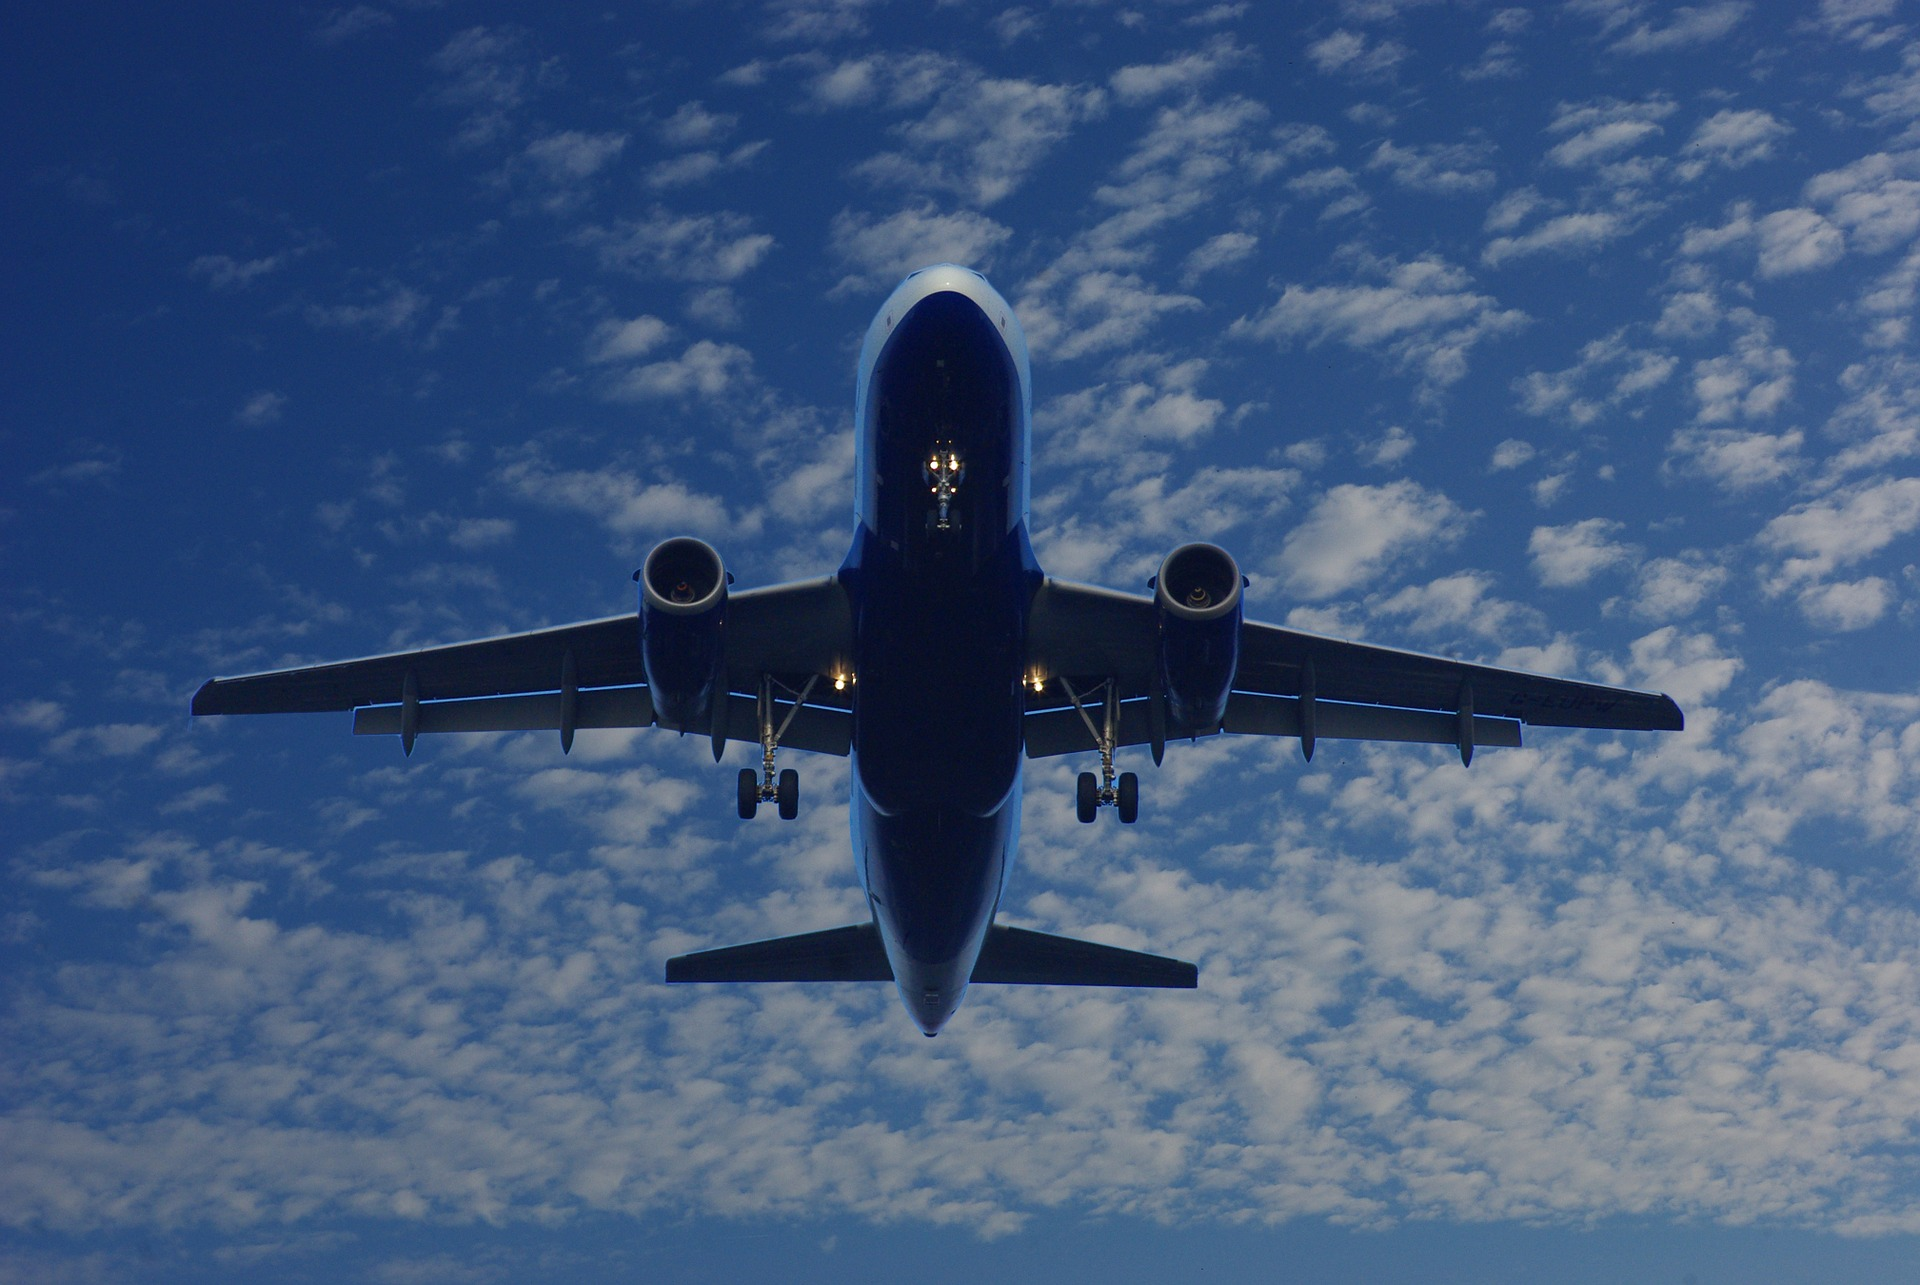 Commercial jet in flight